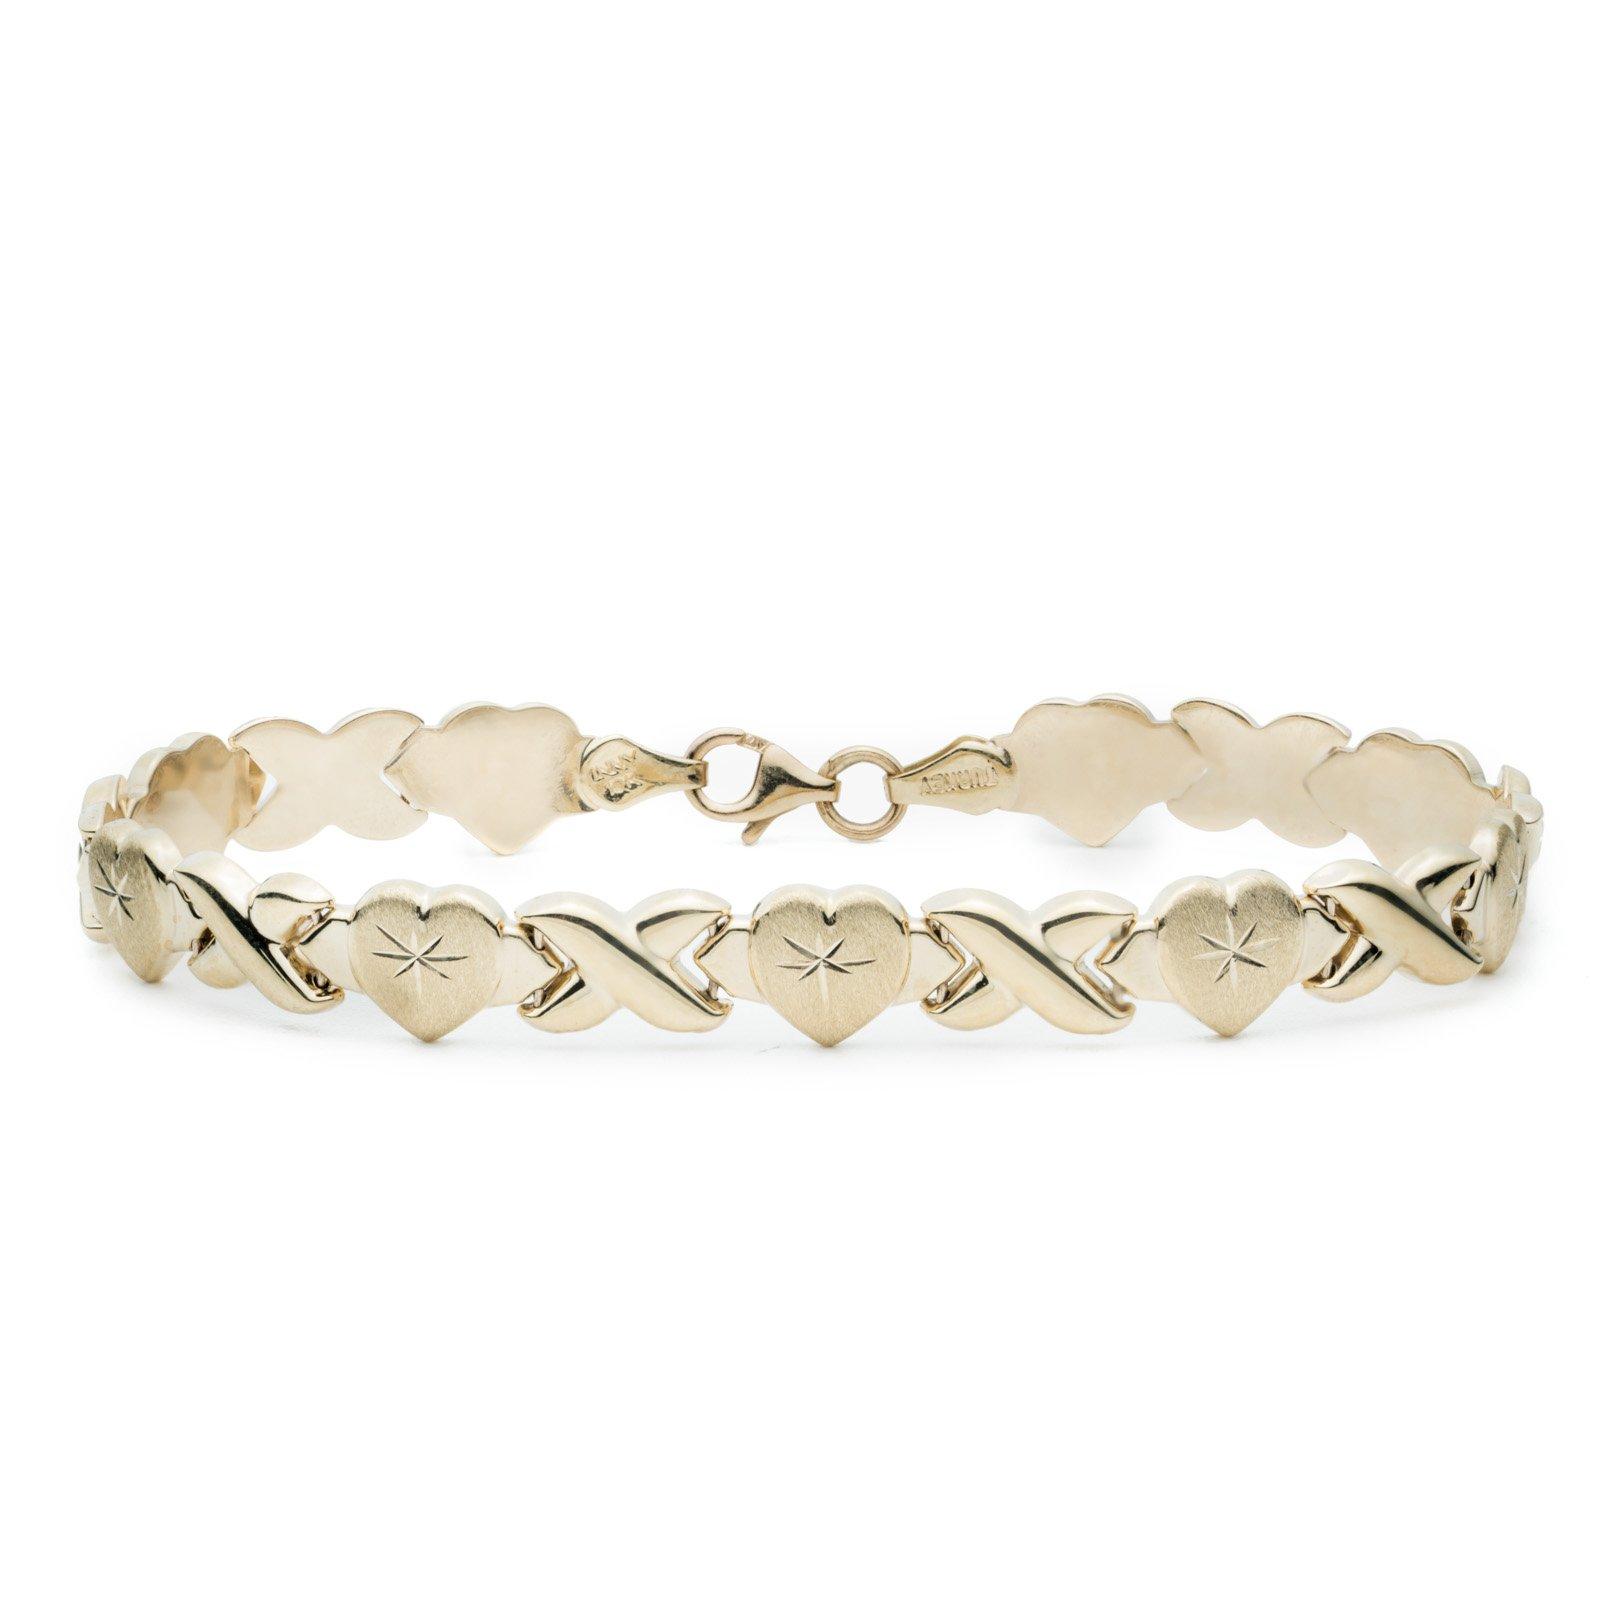 7 Inch 10k Yellow Gold Stampato Xoxo X & Heart Chain Bracelet